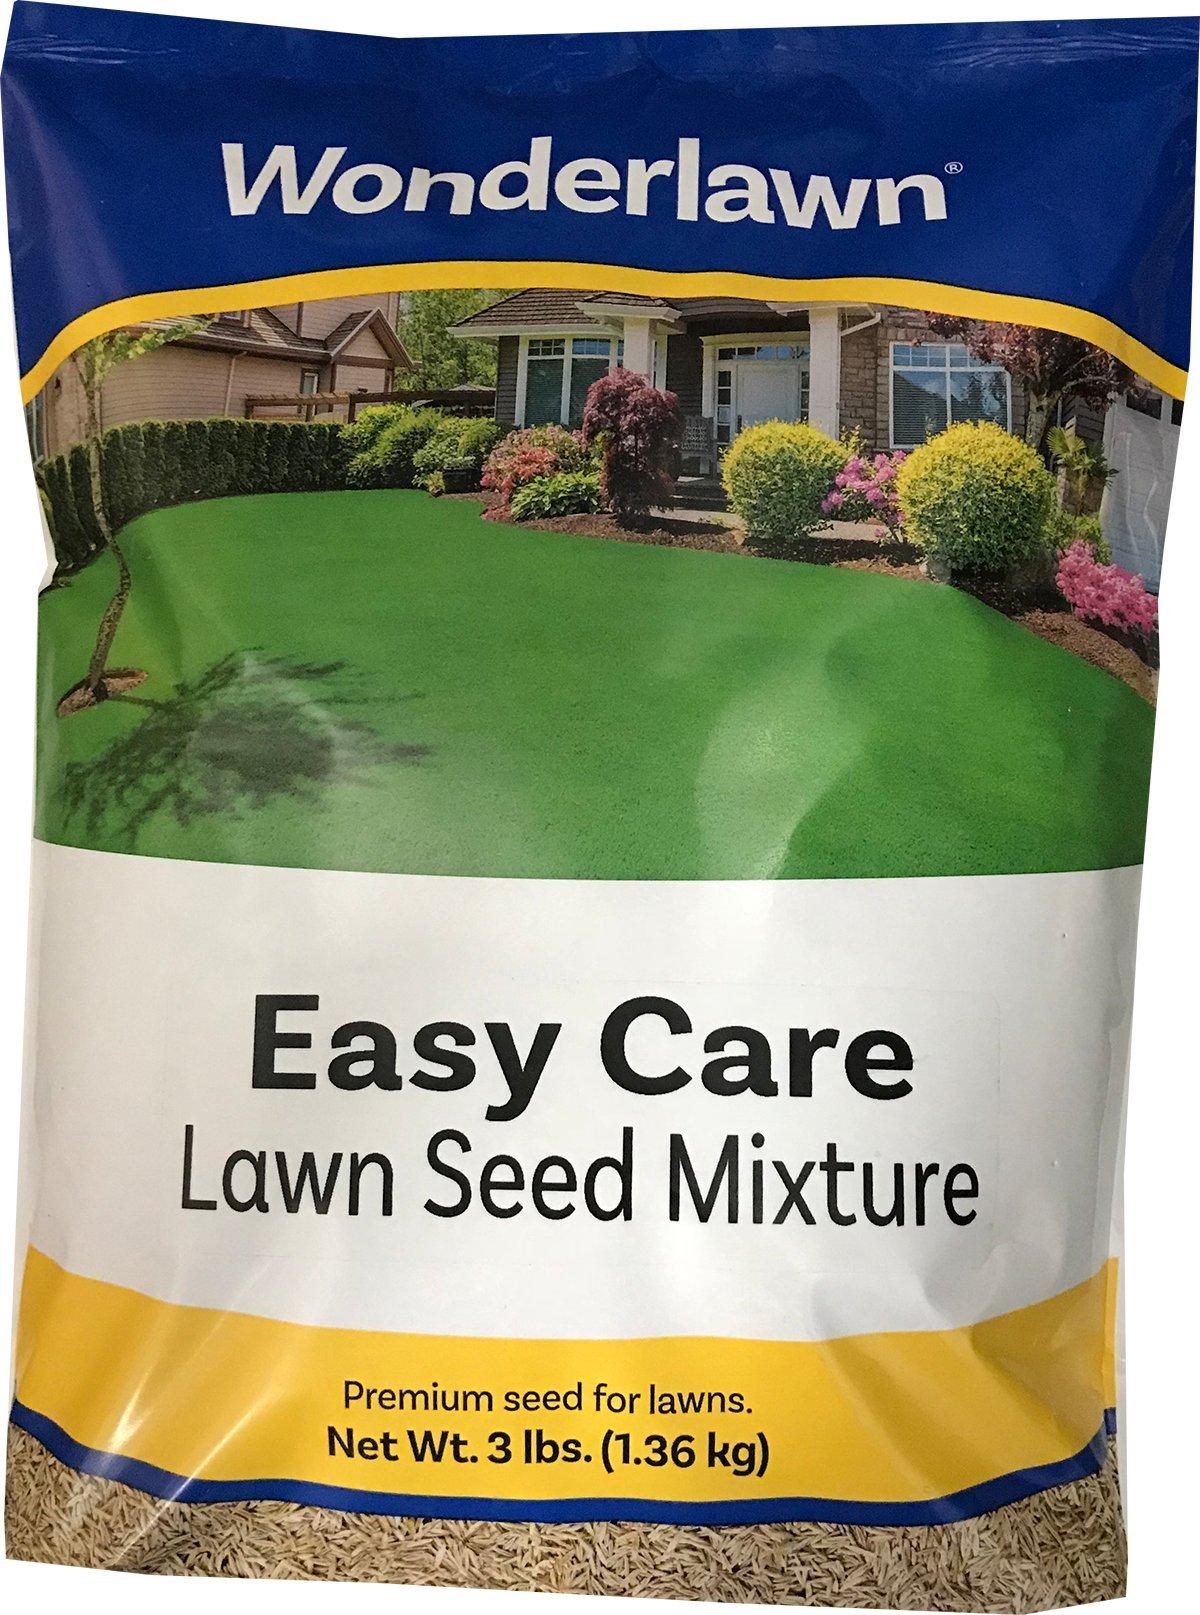 Wonderlawn 25462 EasyCare3North Lawn Seed Mixture, 3 lb